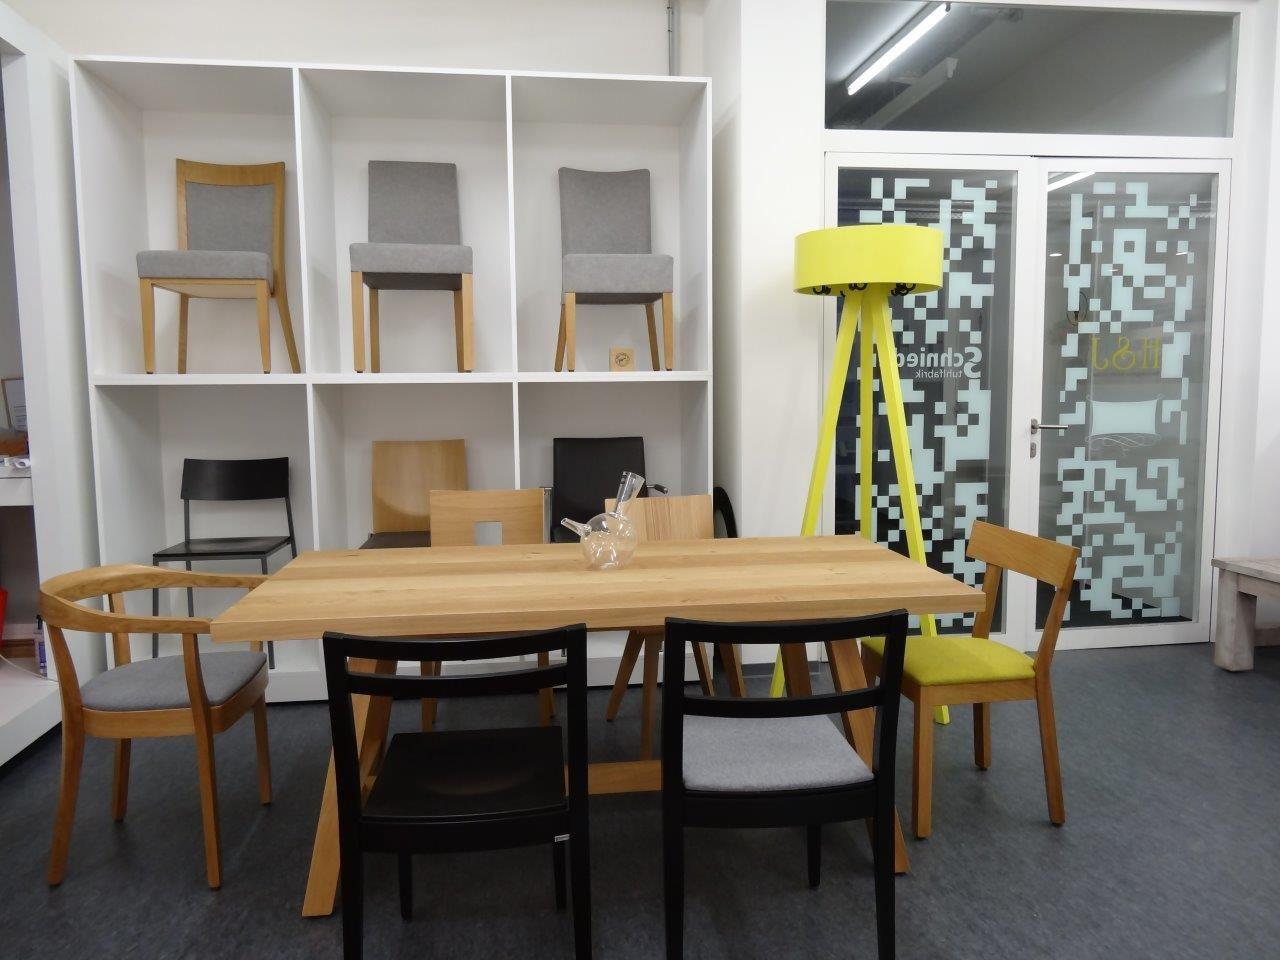 Ausstellung in Berlin Next Malzfabrik Bessemerstraße 16, 2